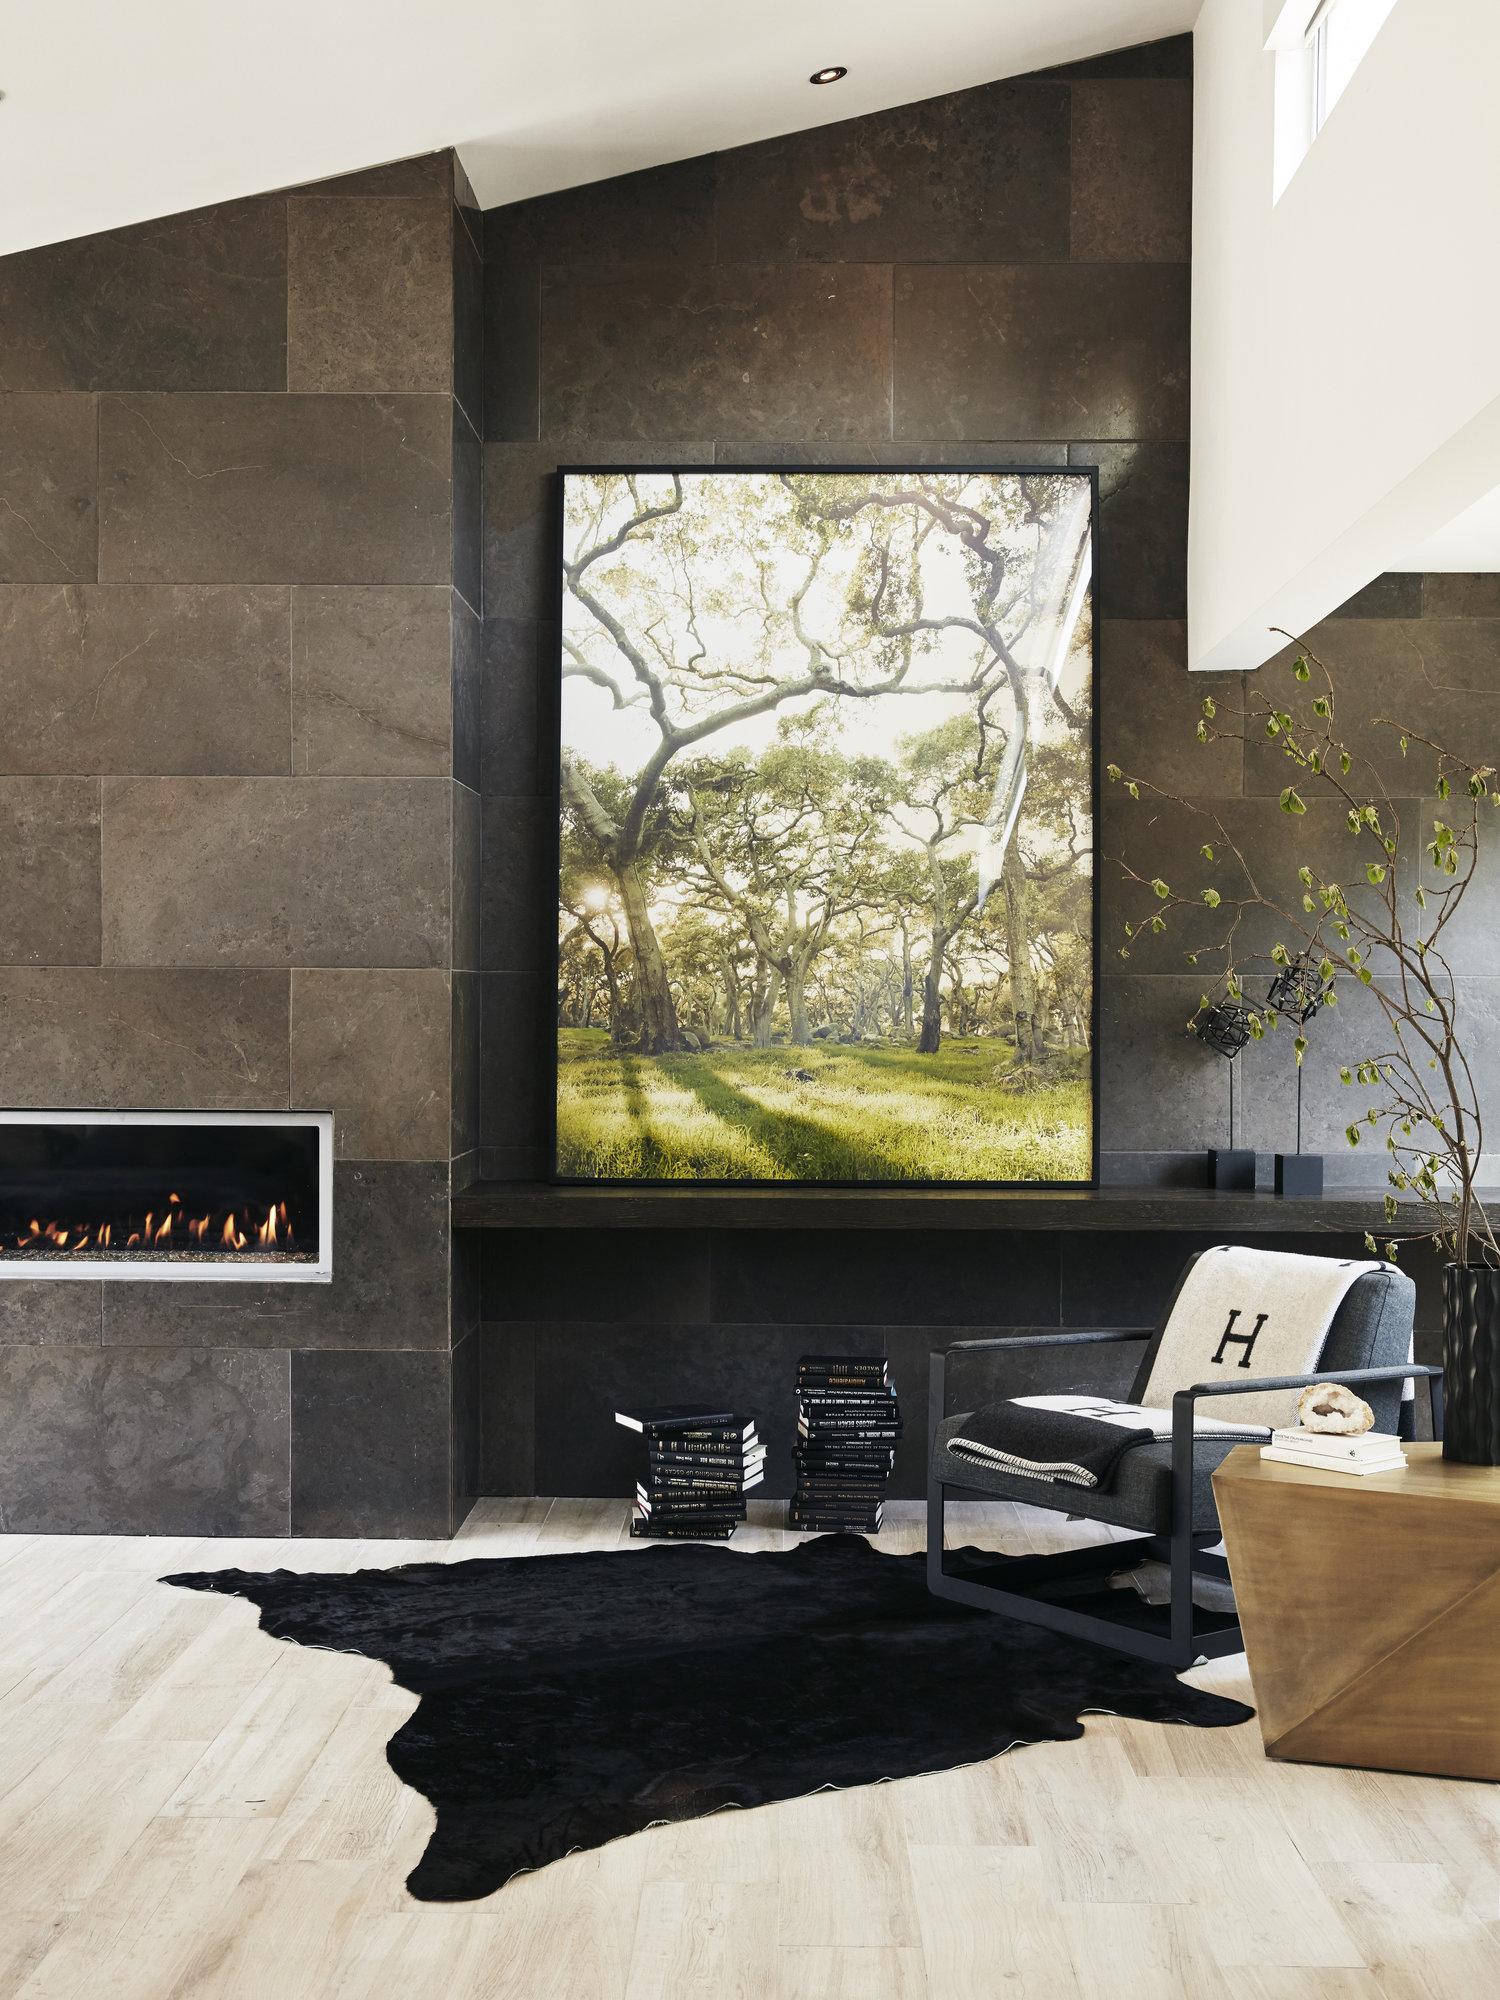 Home+for+sale+in+Montecito+Santa+Barbara+California+contemporary+homes+modern+homes+ikea+home+inspiration+36+Canon+View+Riskin+Partners-4.jpeg